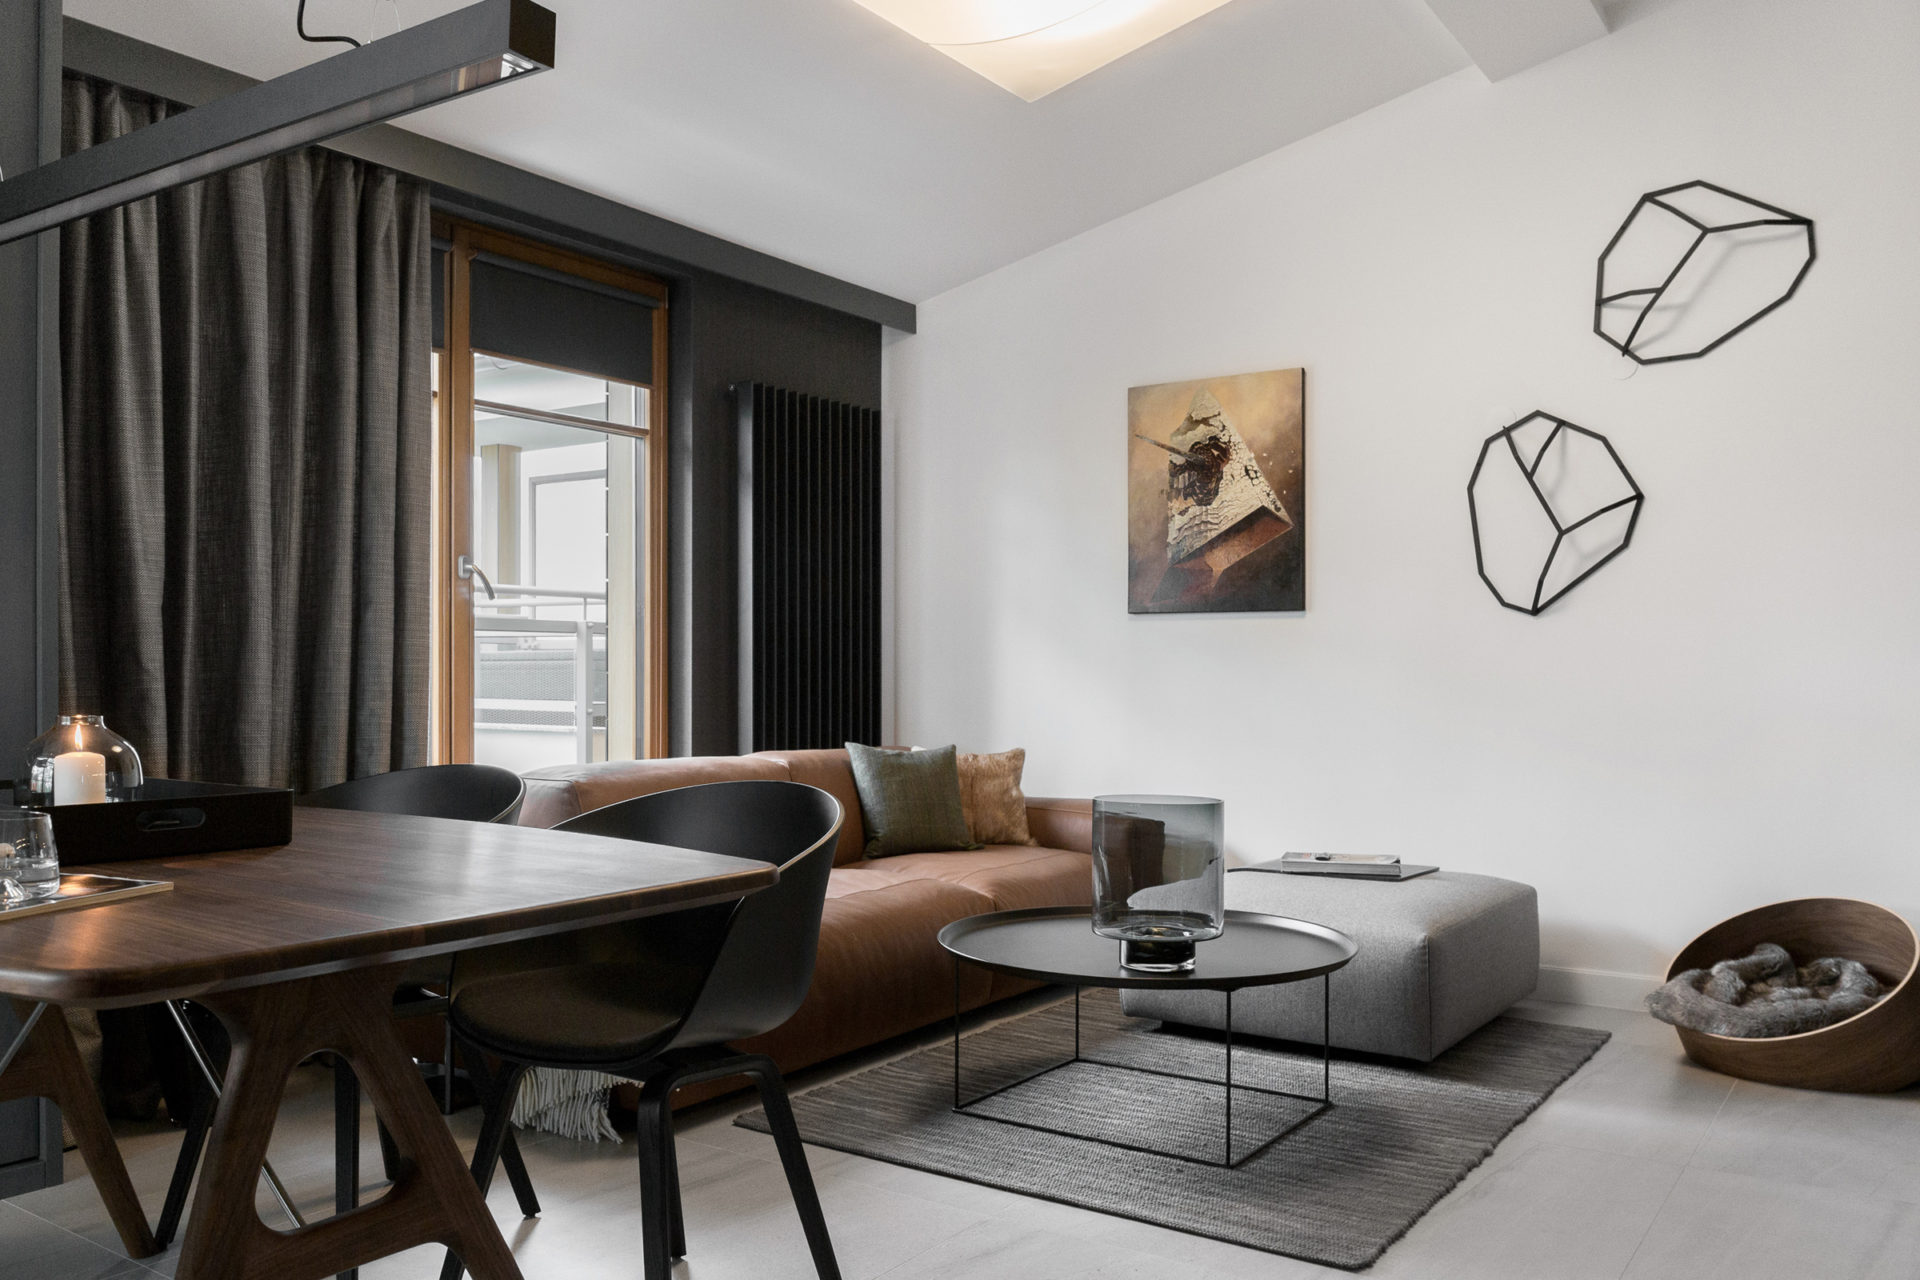 Apartament w Sopocie 2017 - 02